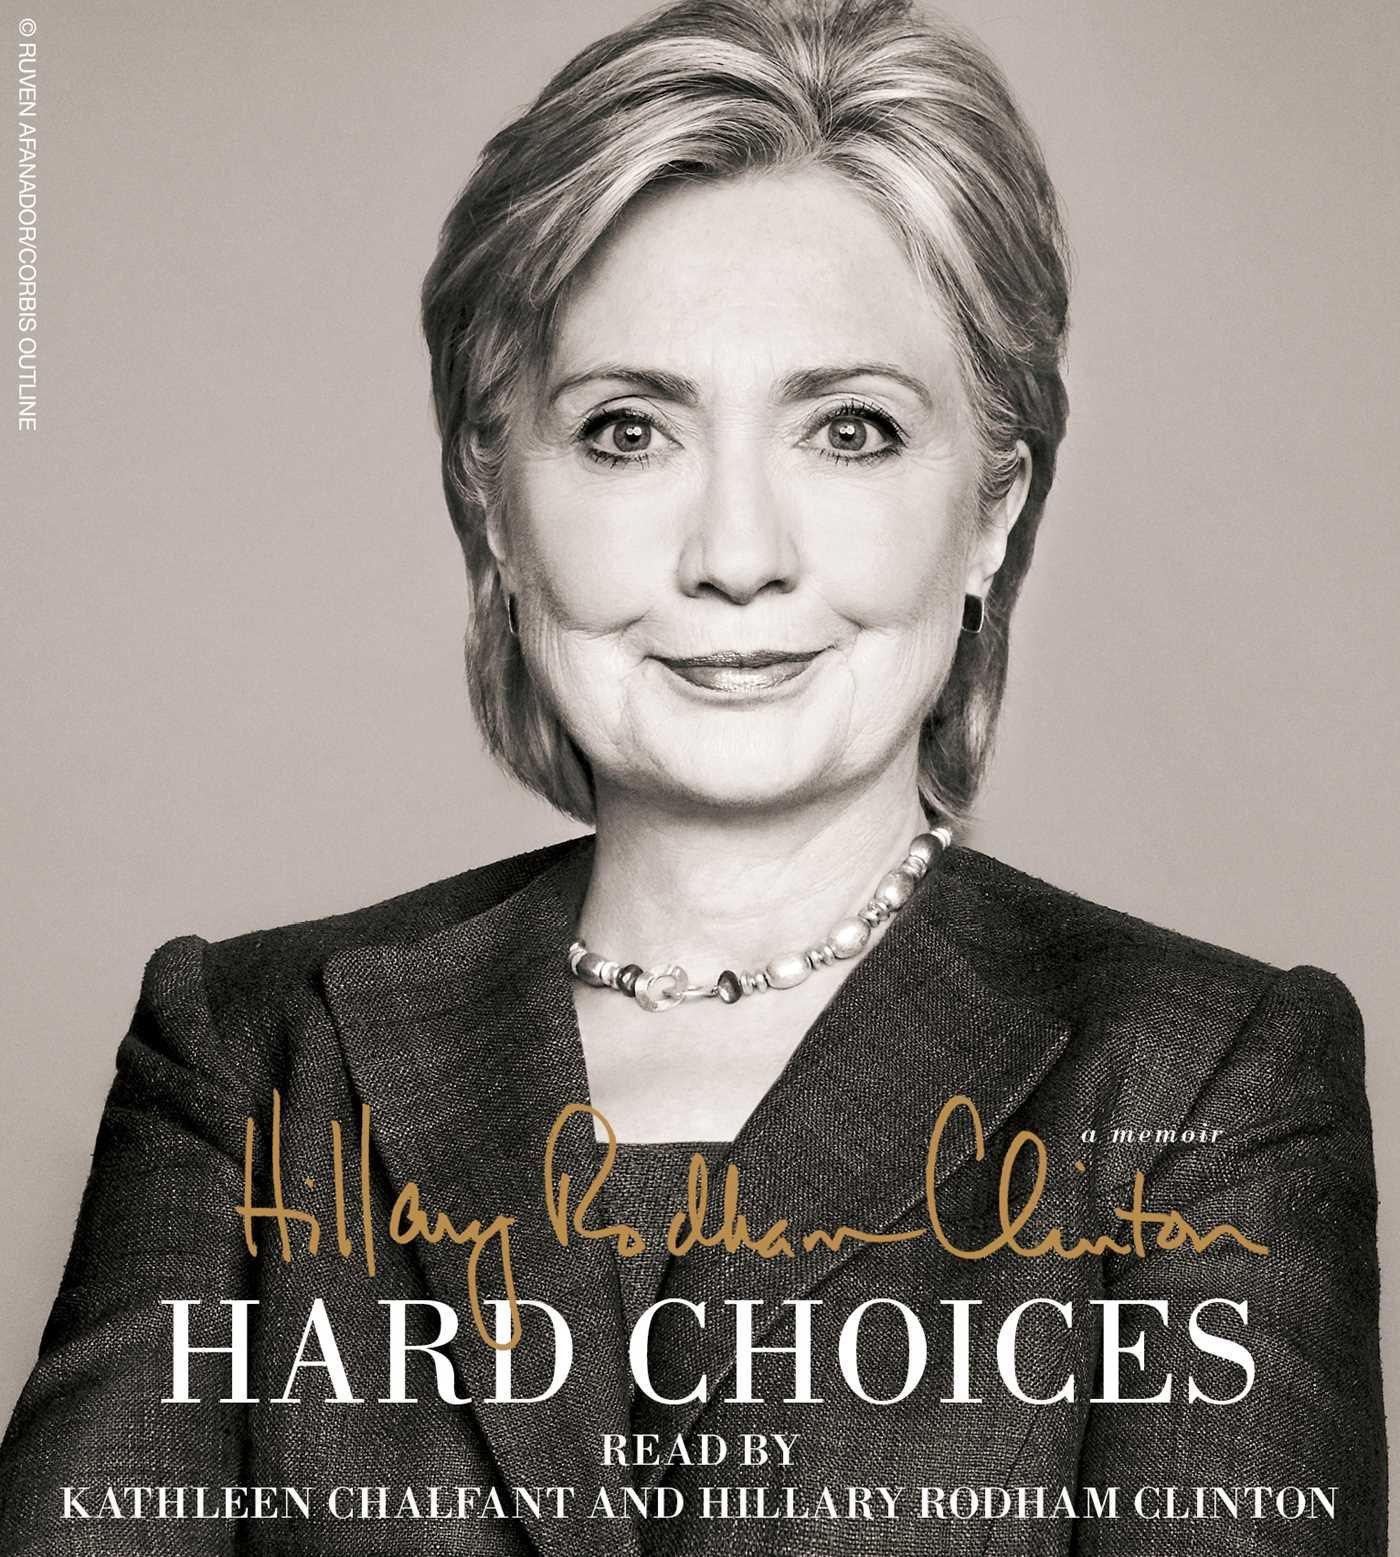 hard choices hillary rodham clinton kathleen chalfant